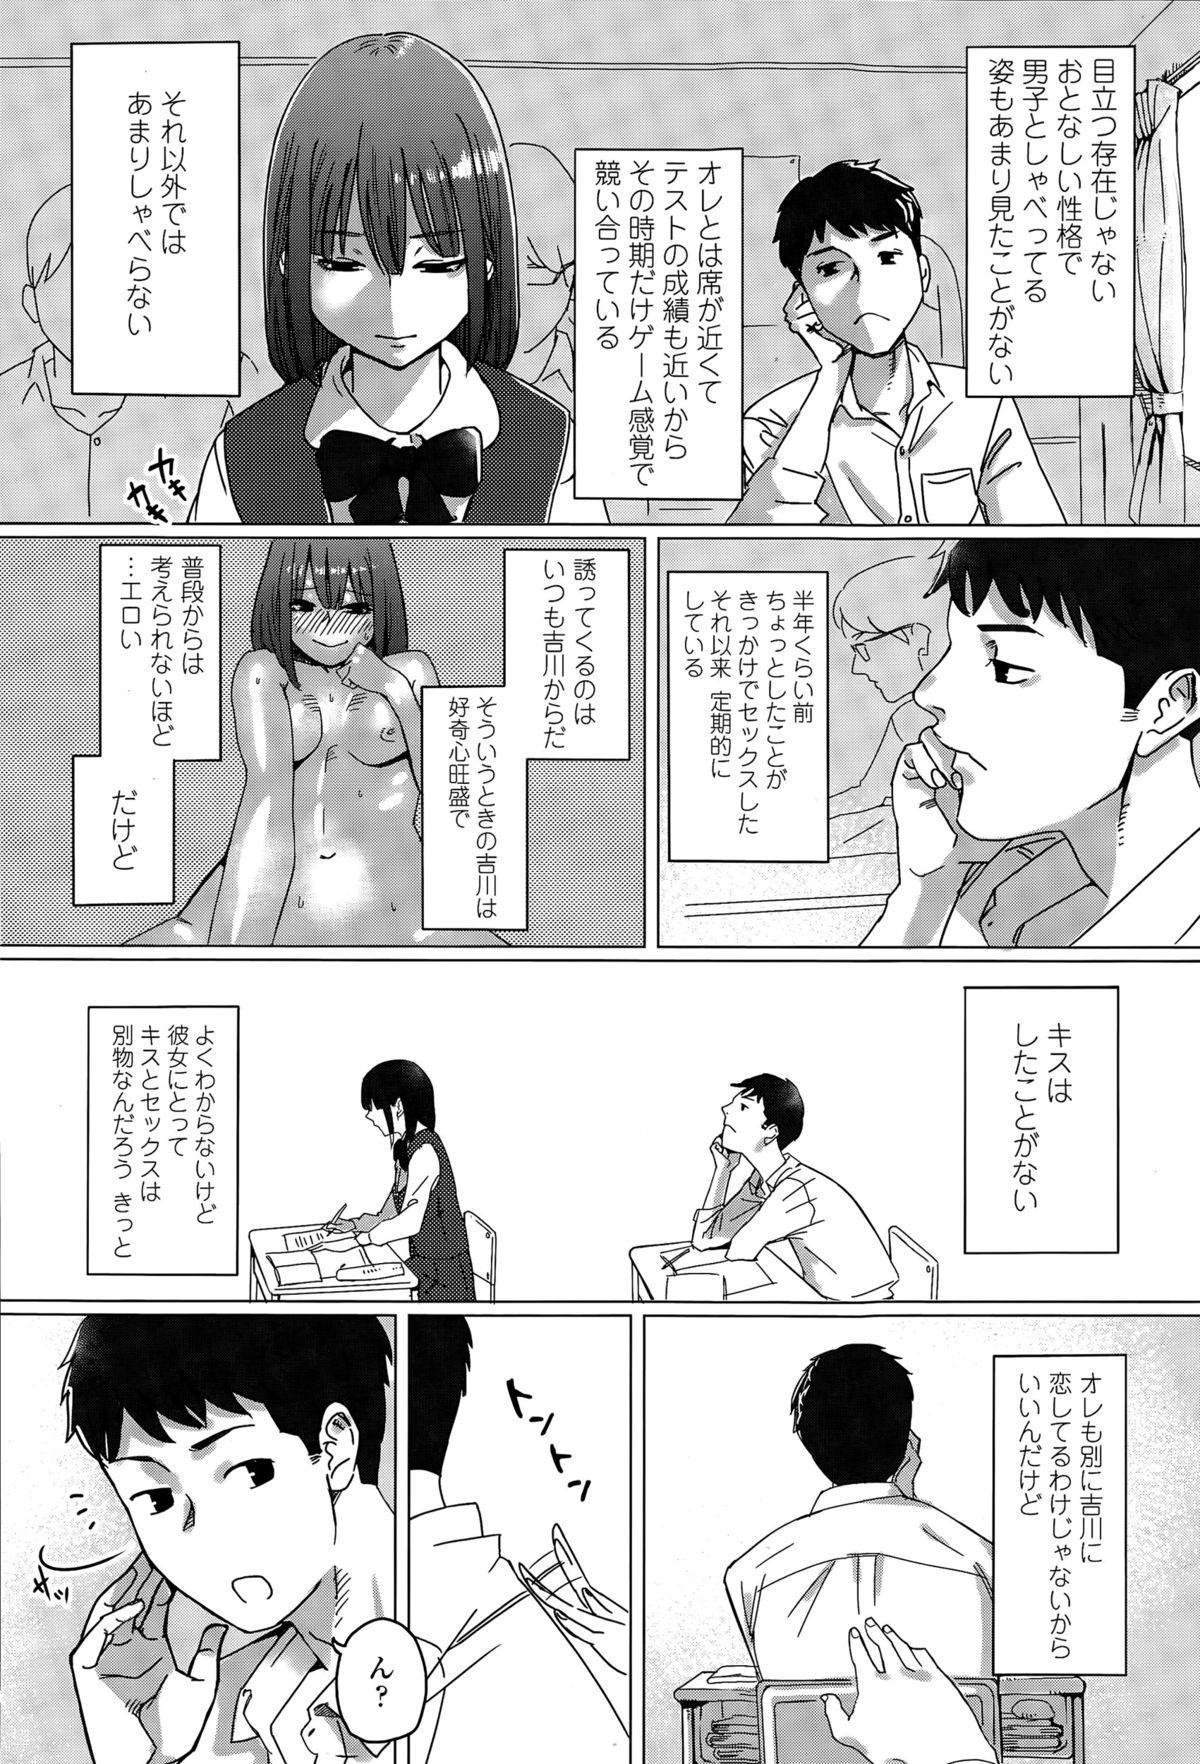 COMIC Koh Vol. 6 335